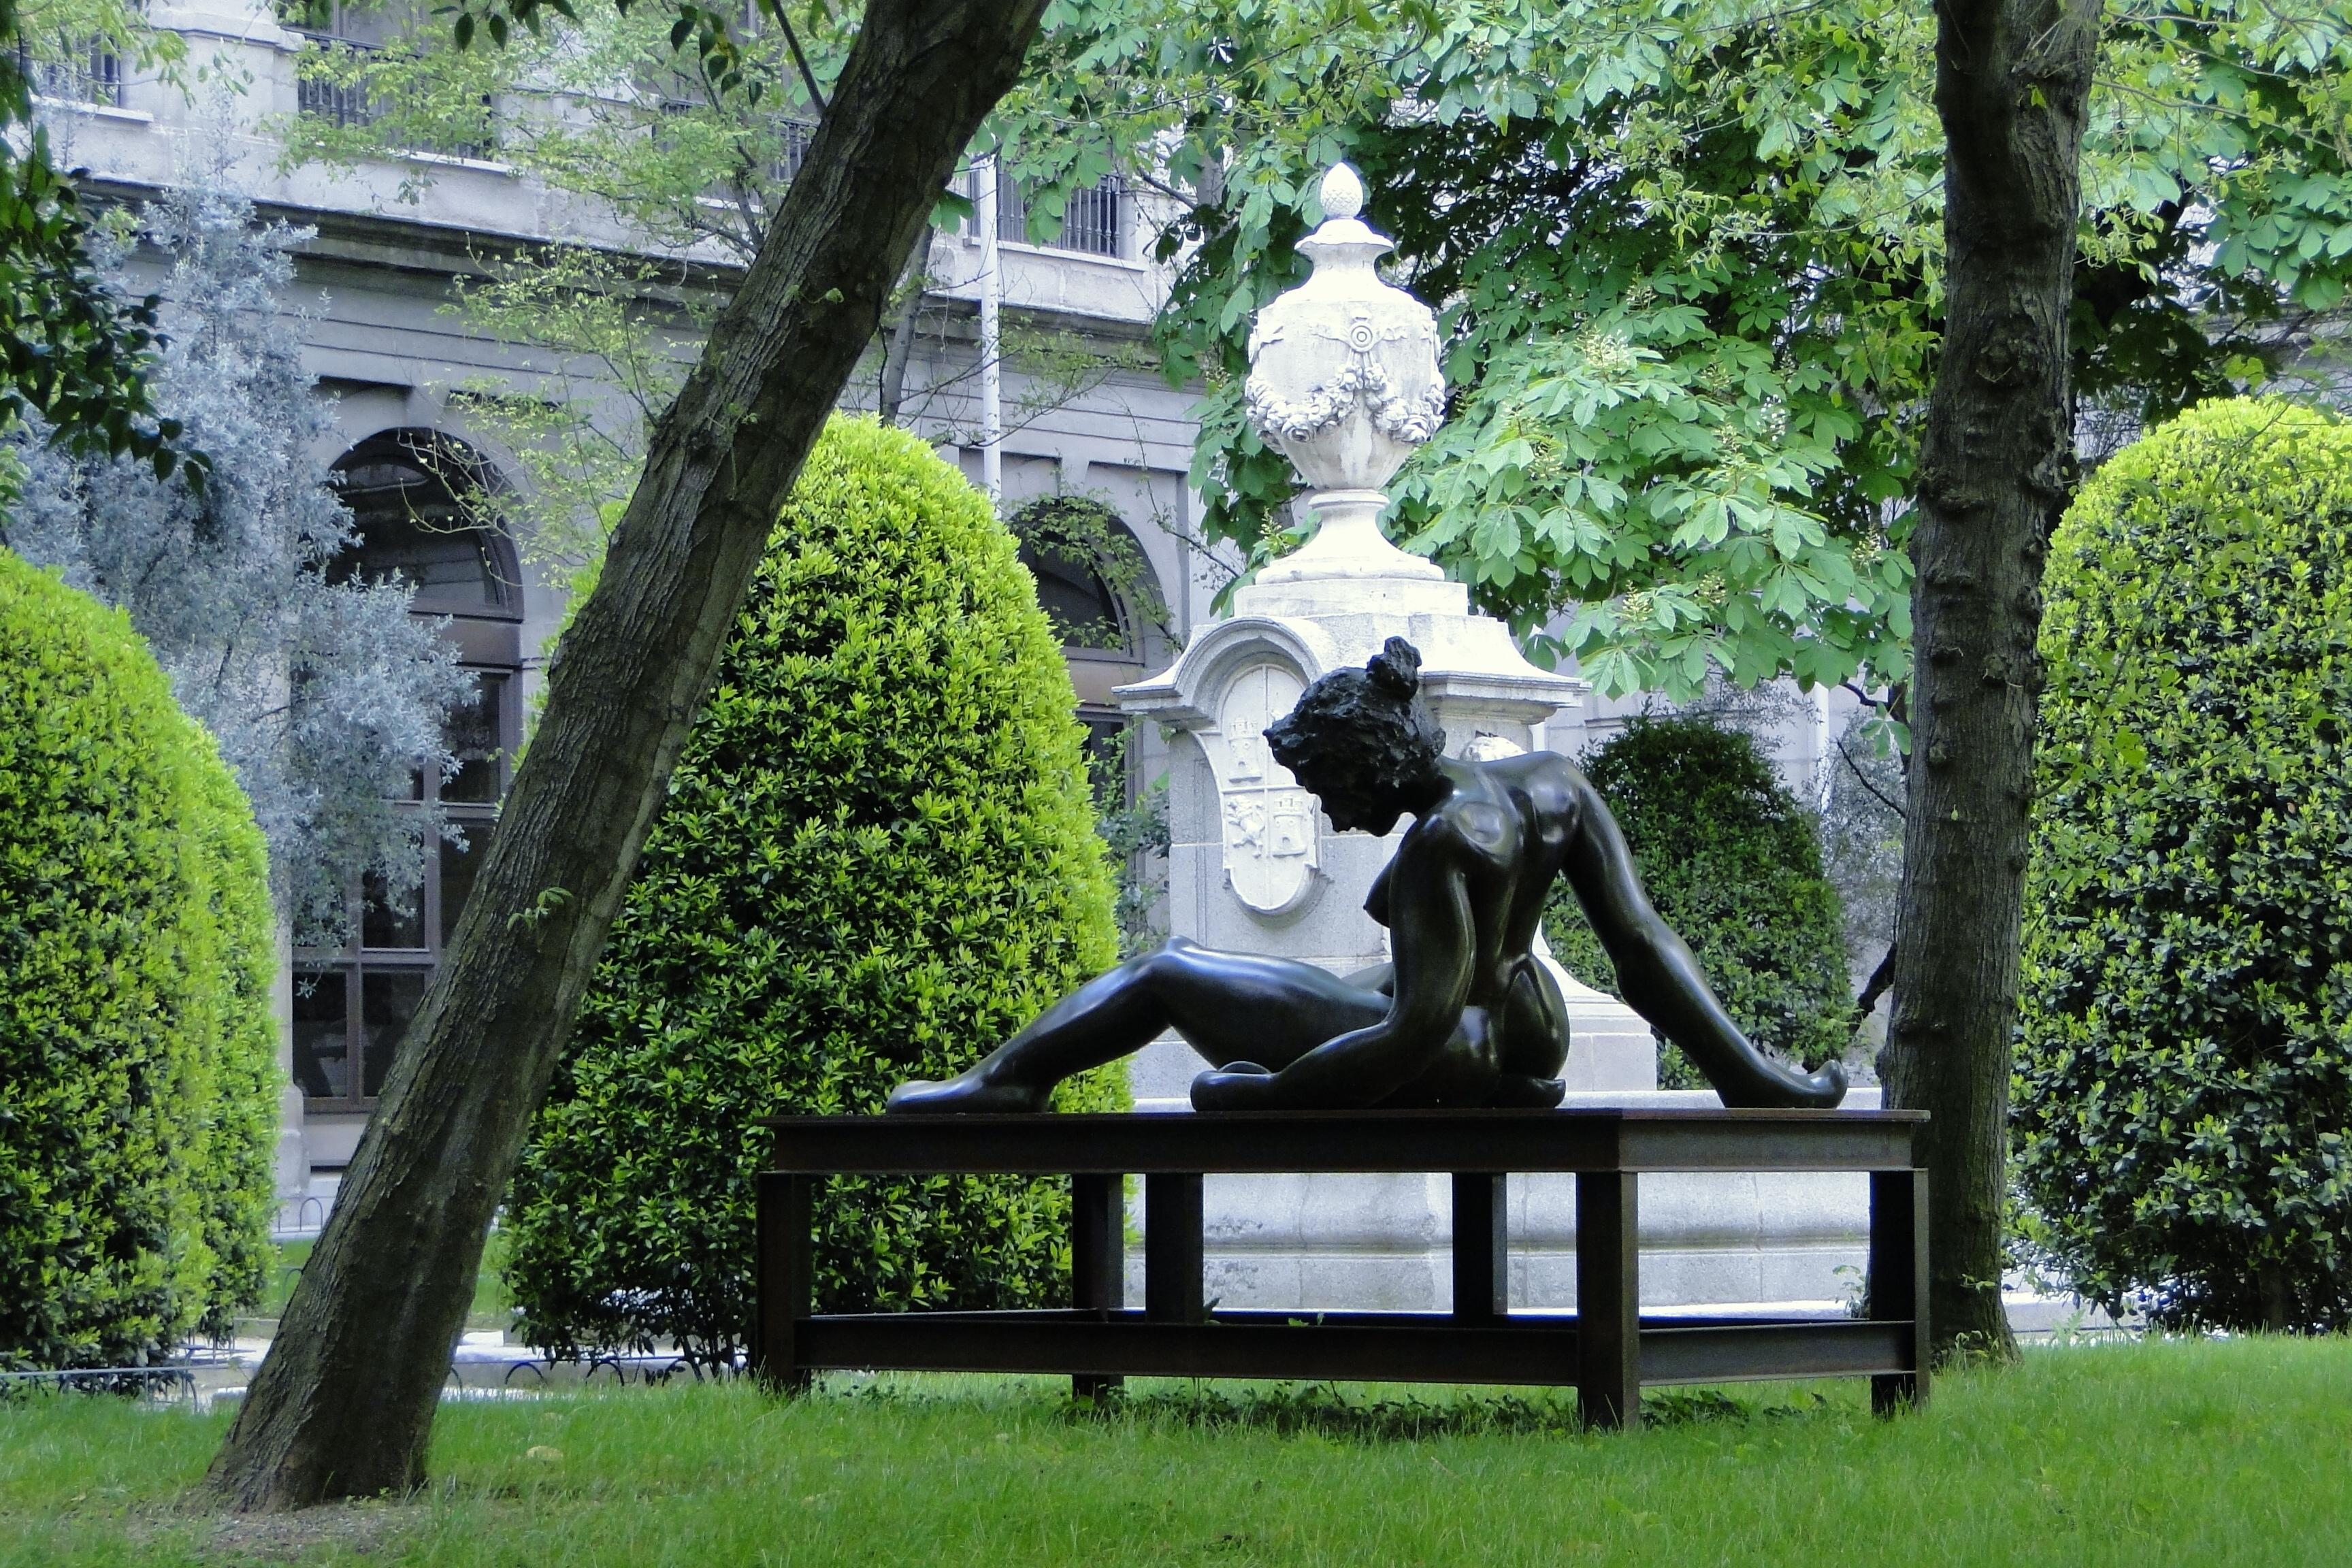 File:Garden of Museo Reina Sofia - Madrid - Spain.jpg - Wikimedia Commons